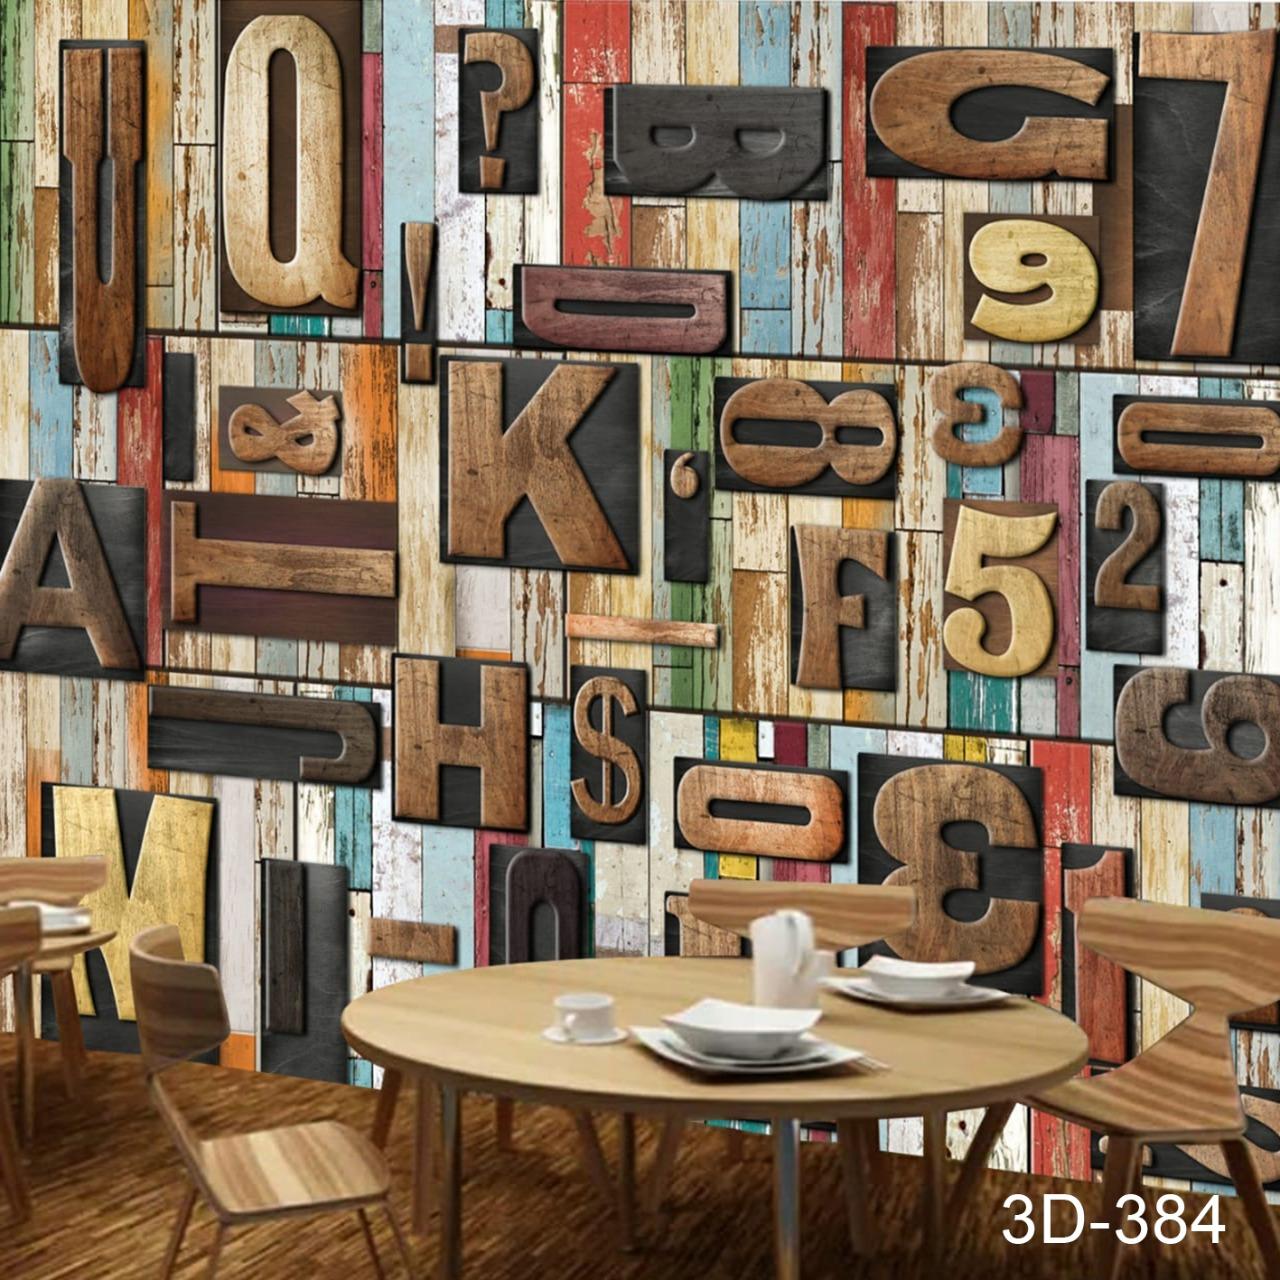 Jual Wallpaper Dinding Jakarta Selatan Online Toko Wallpaper Dinding